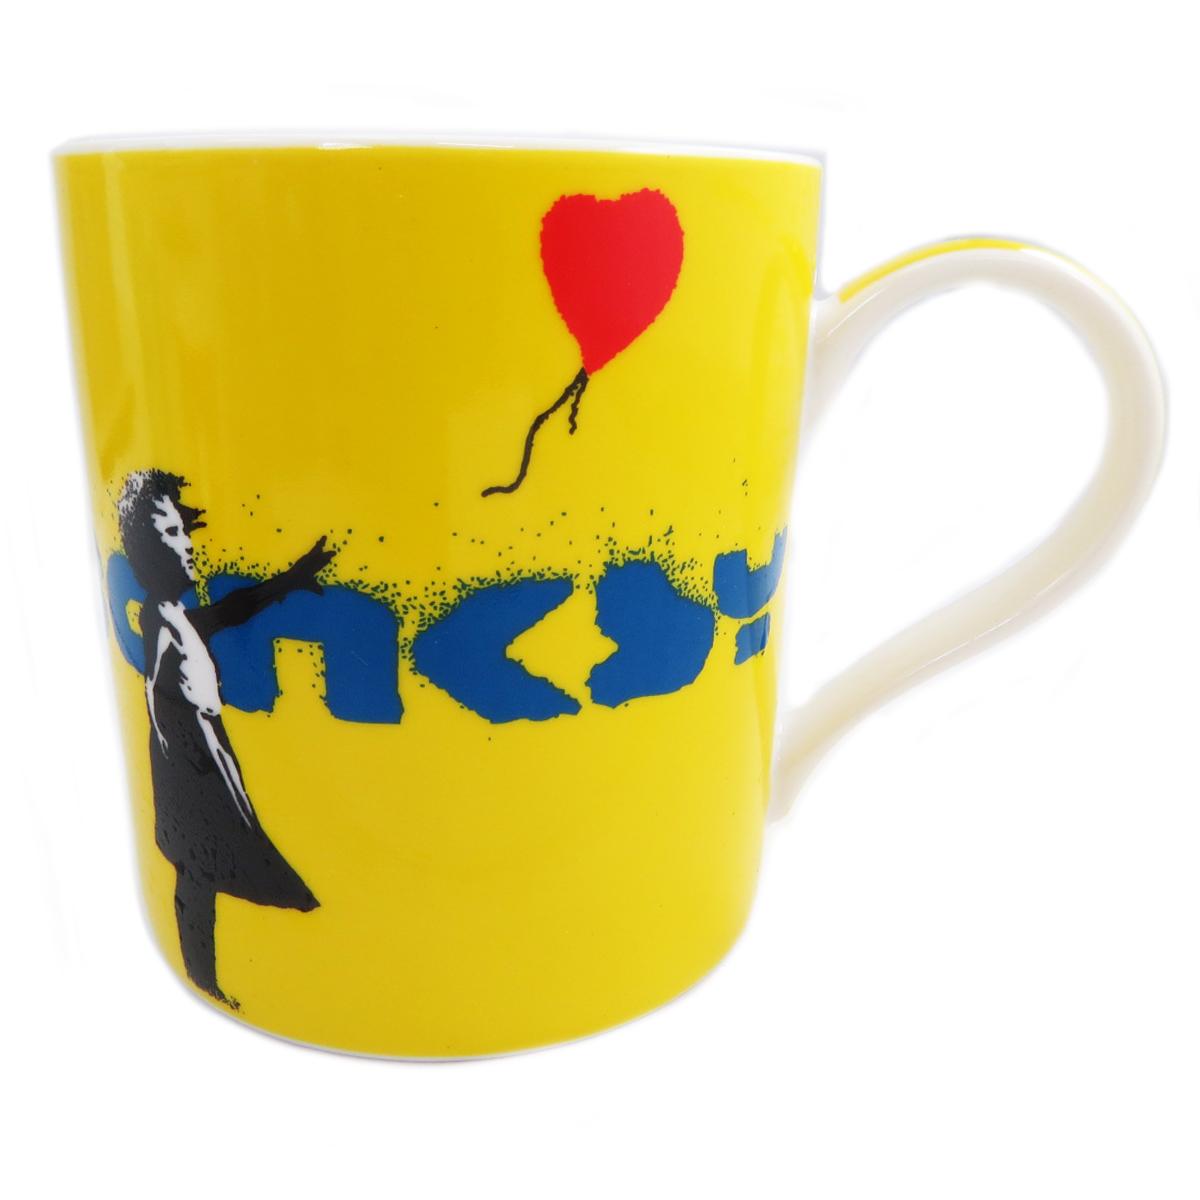 Mug porcelaine \'Banksy\' jaune (girl with balloon) - 90x85 mm - [Q8818]